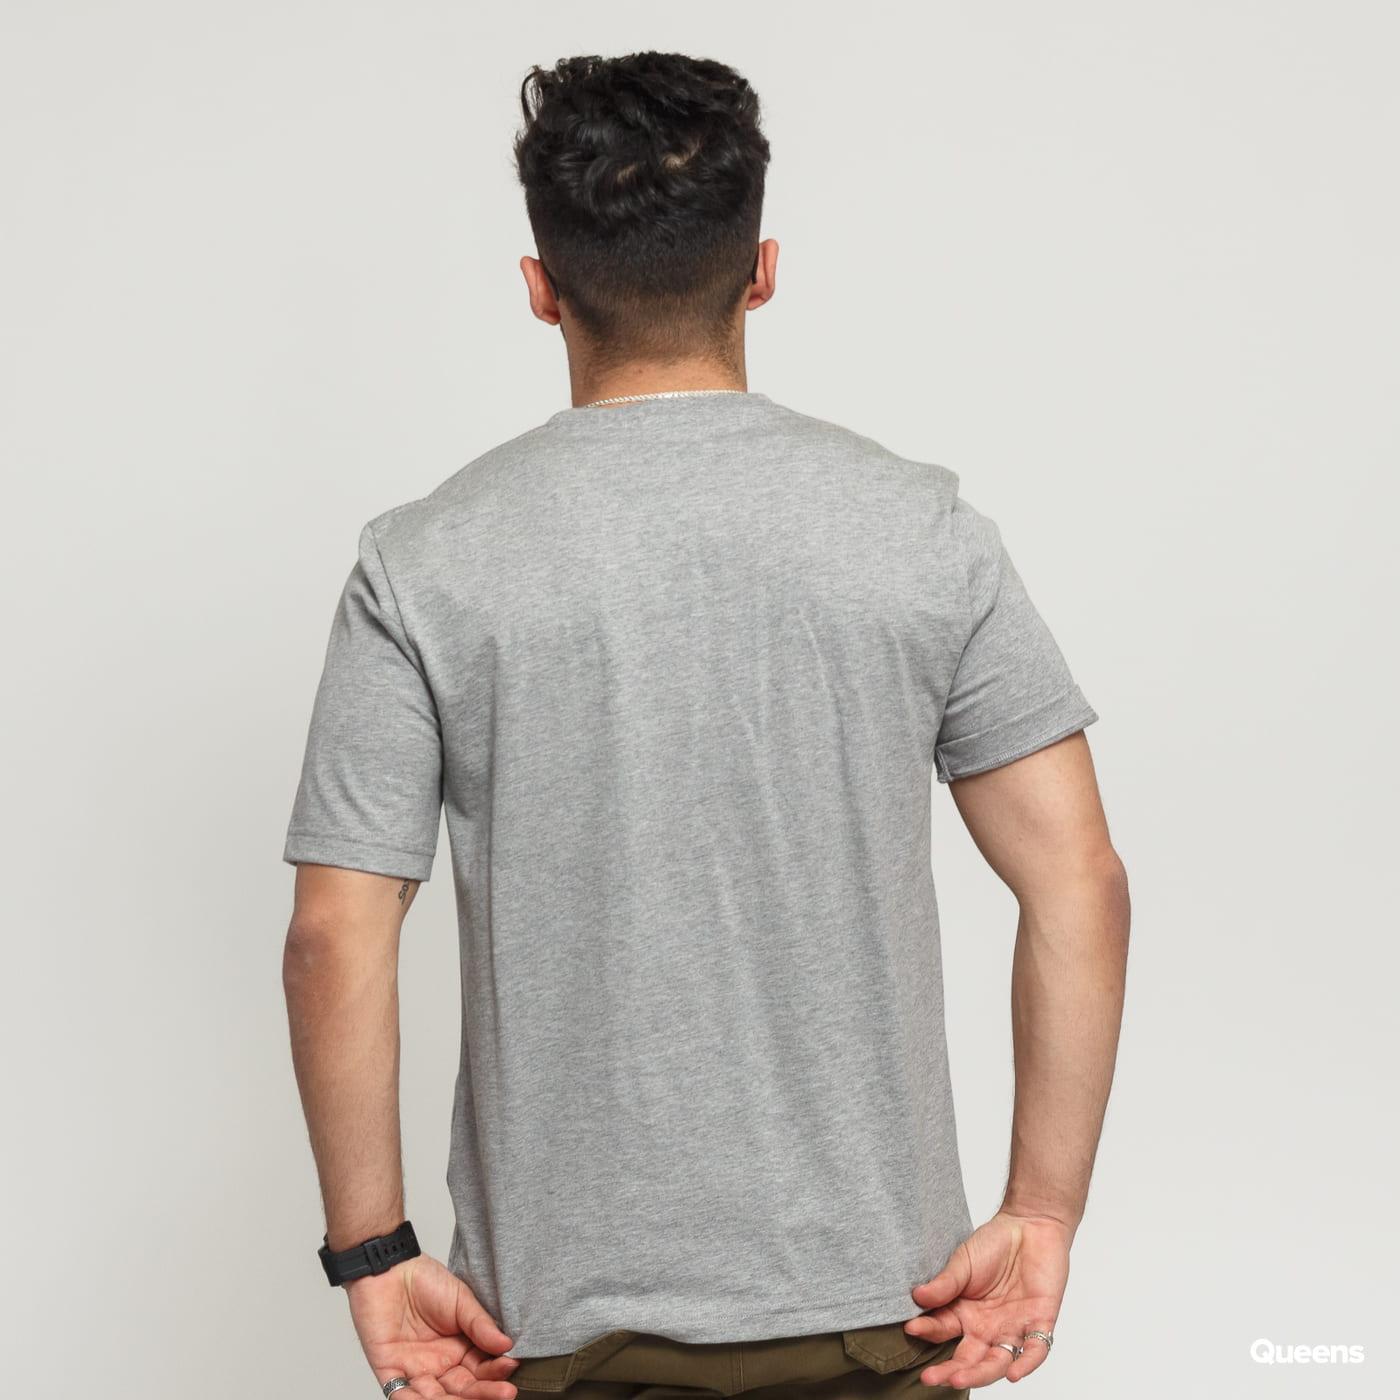 BAND OF OUTSIDERS B Logo Printed SS T-shirt melange šedé / modré